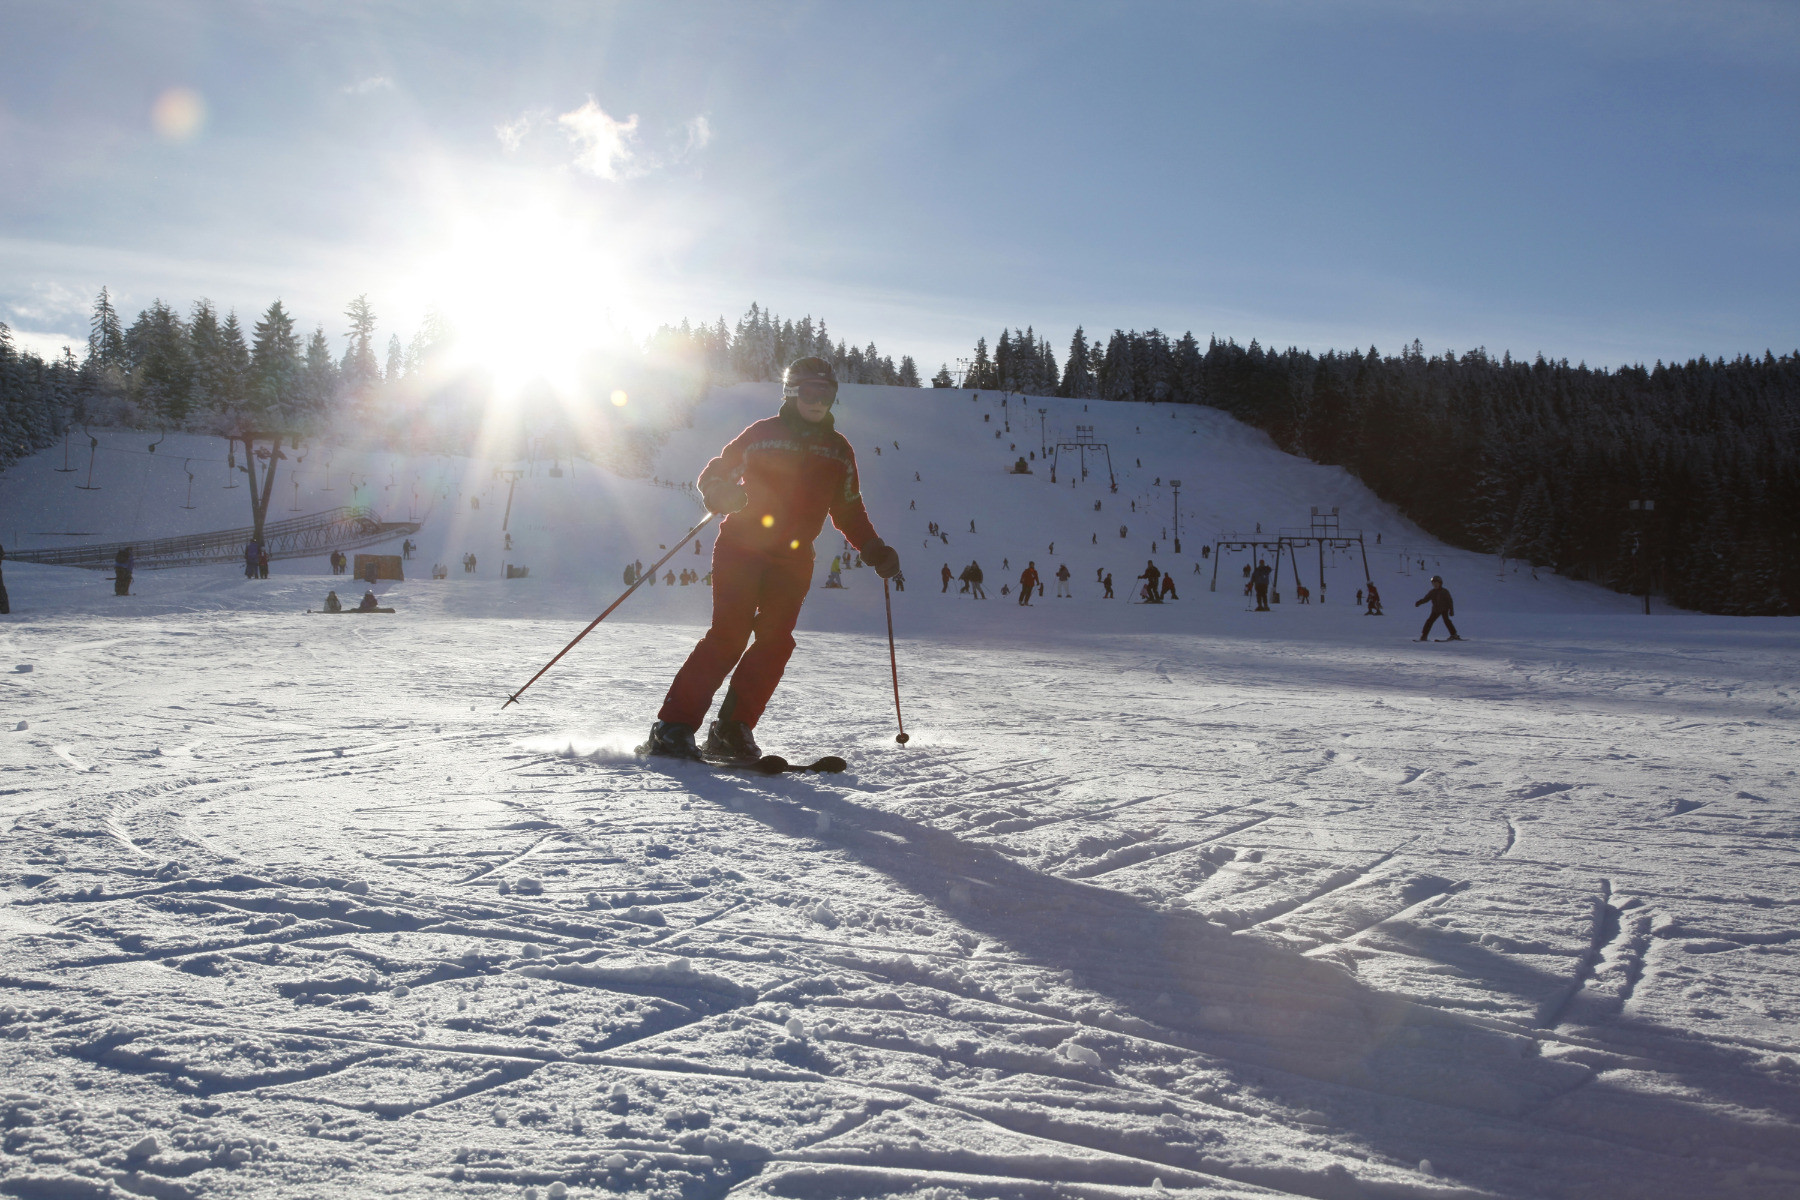 Wintersportregion Murgtal/Bühlertal